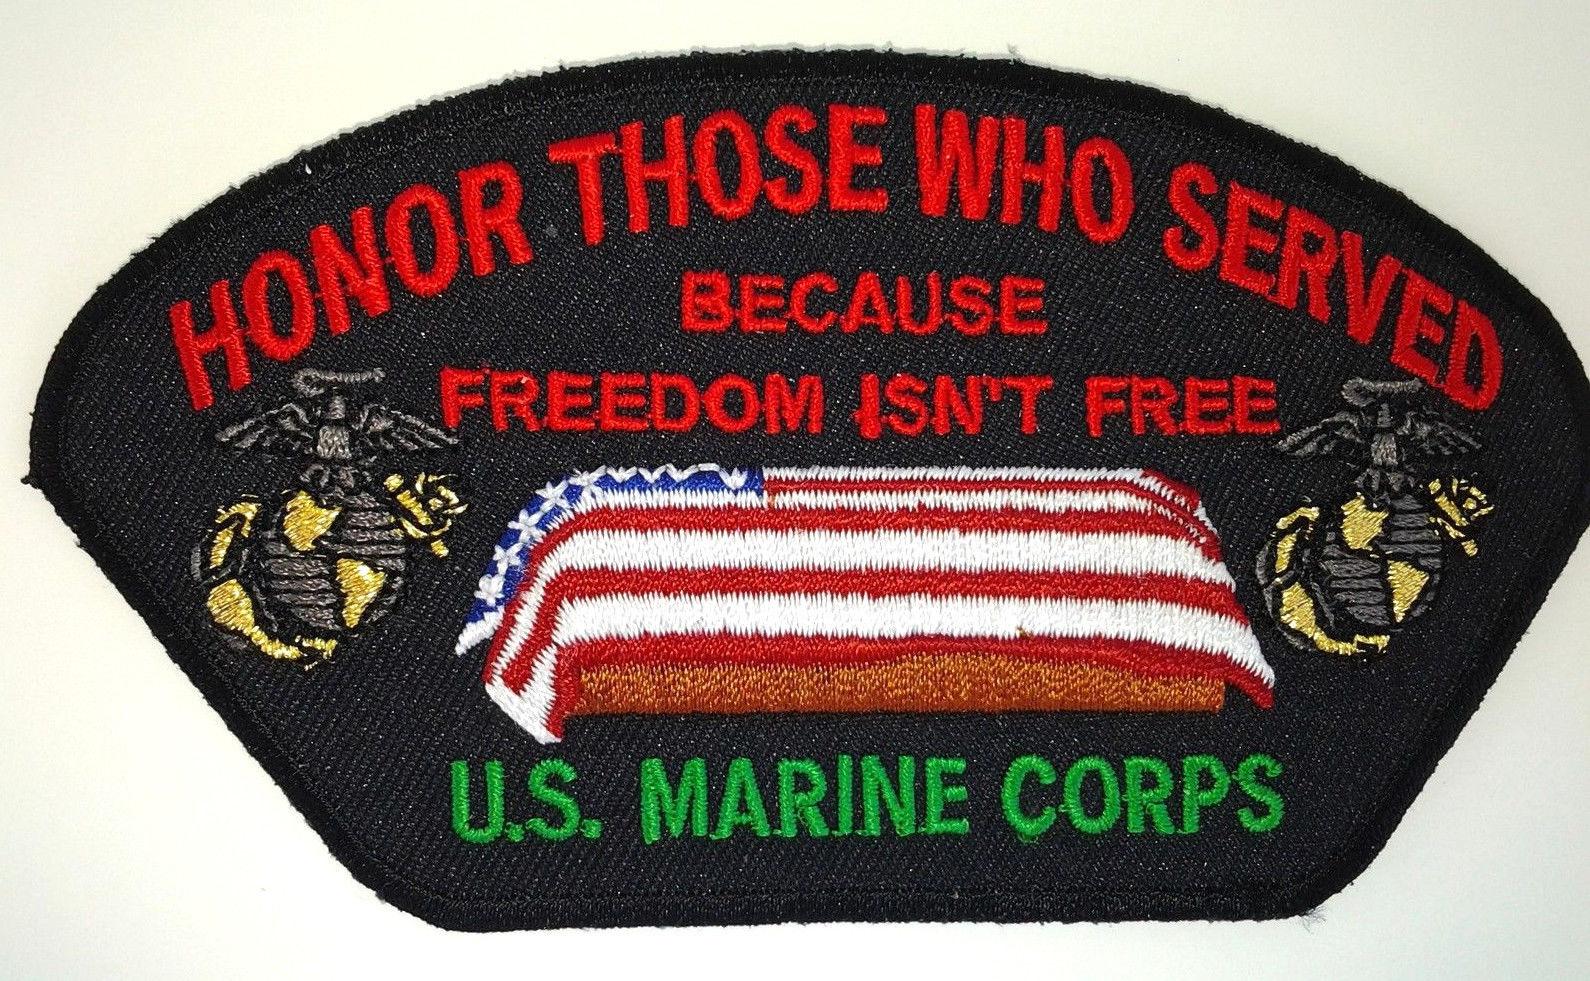 Honor Those Who Served Us Marine Corps Military Veteran Hero Cap Patch D Veterans Heroes Us Marine Corps Marine Corps